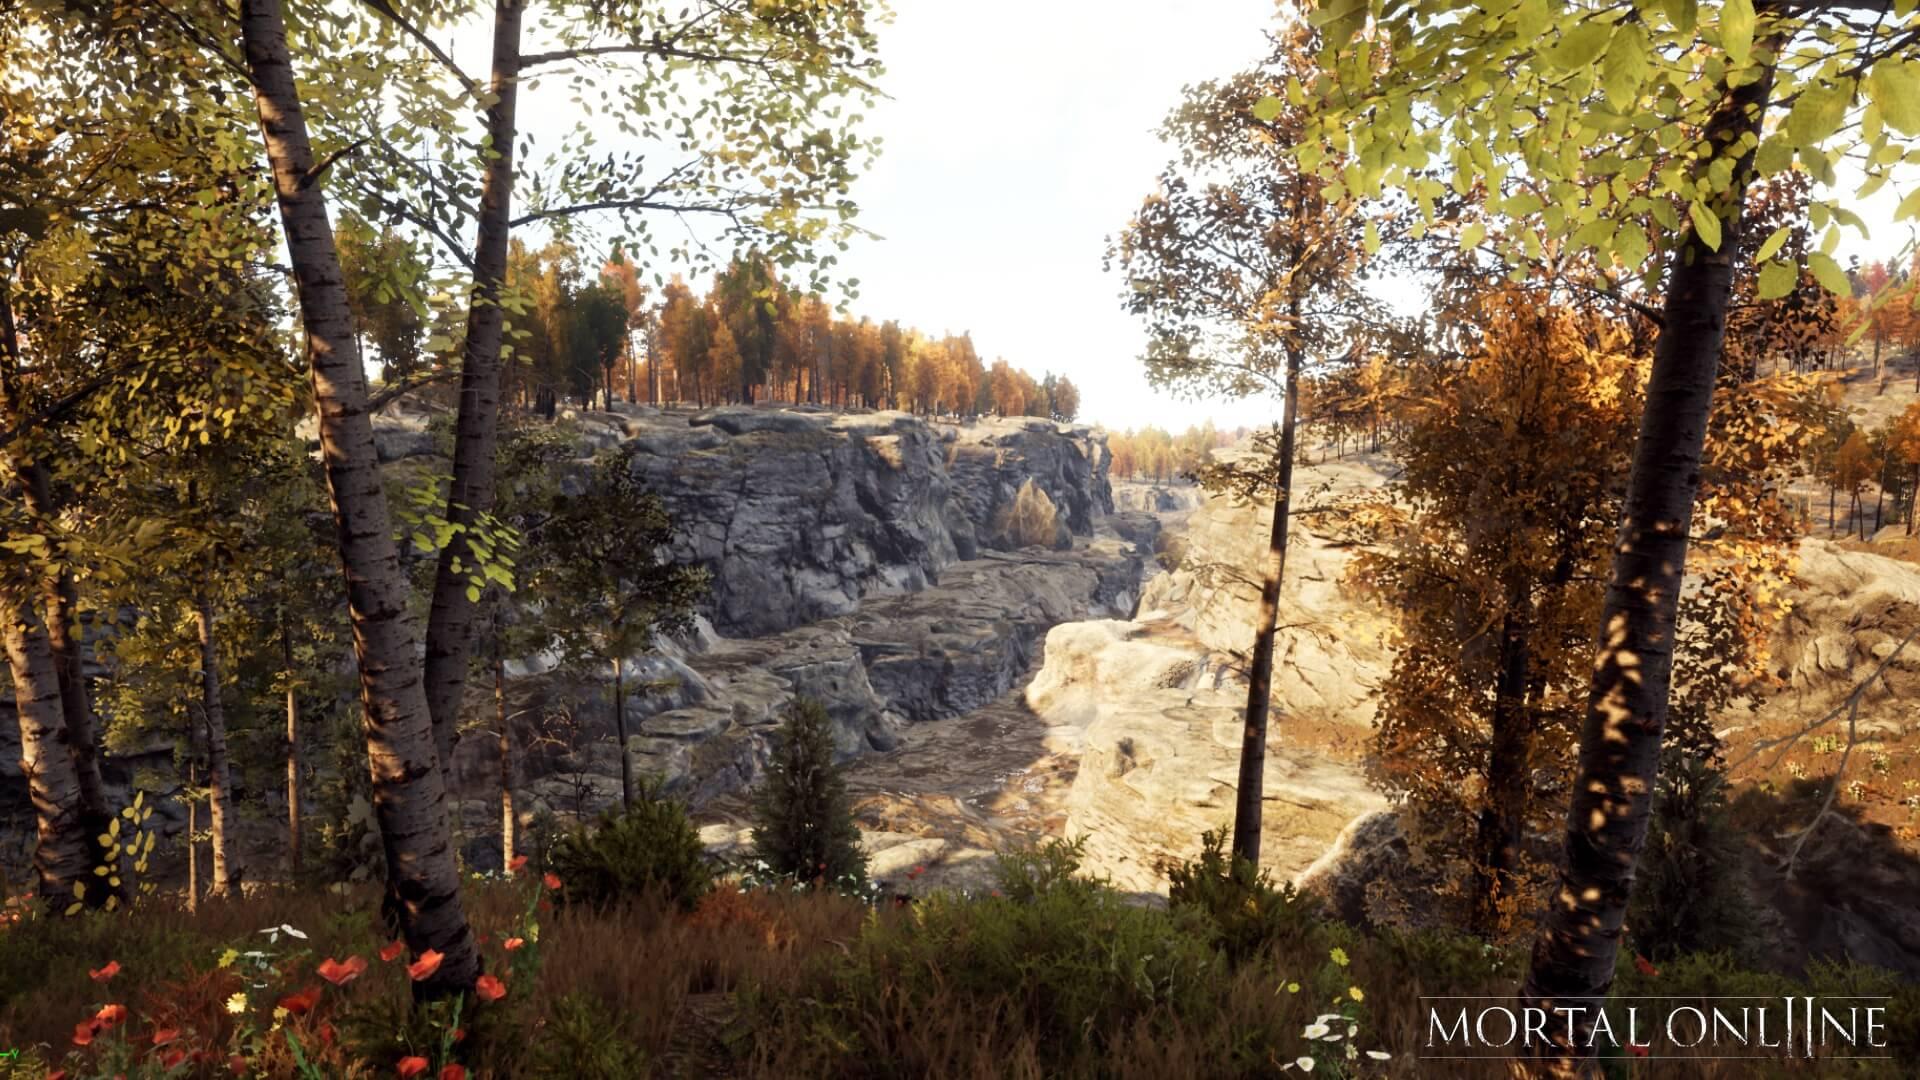 mortalonline2-environment5